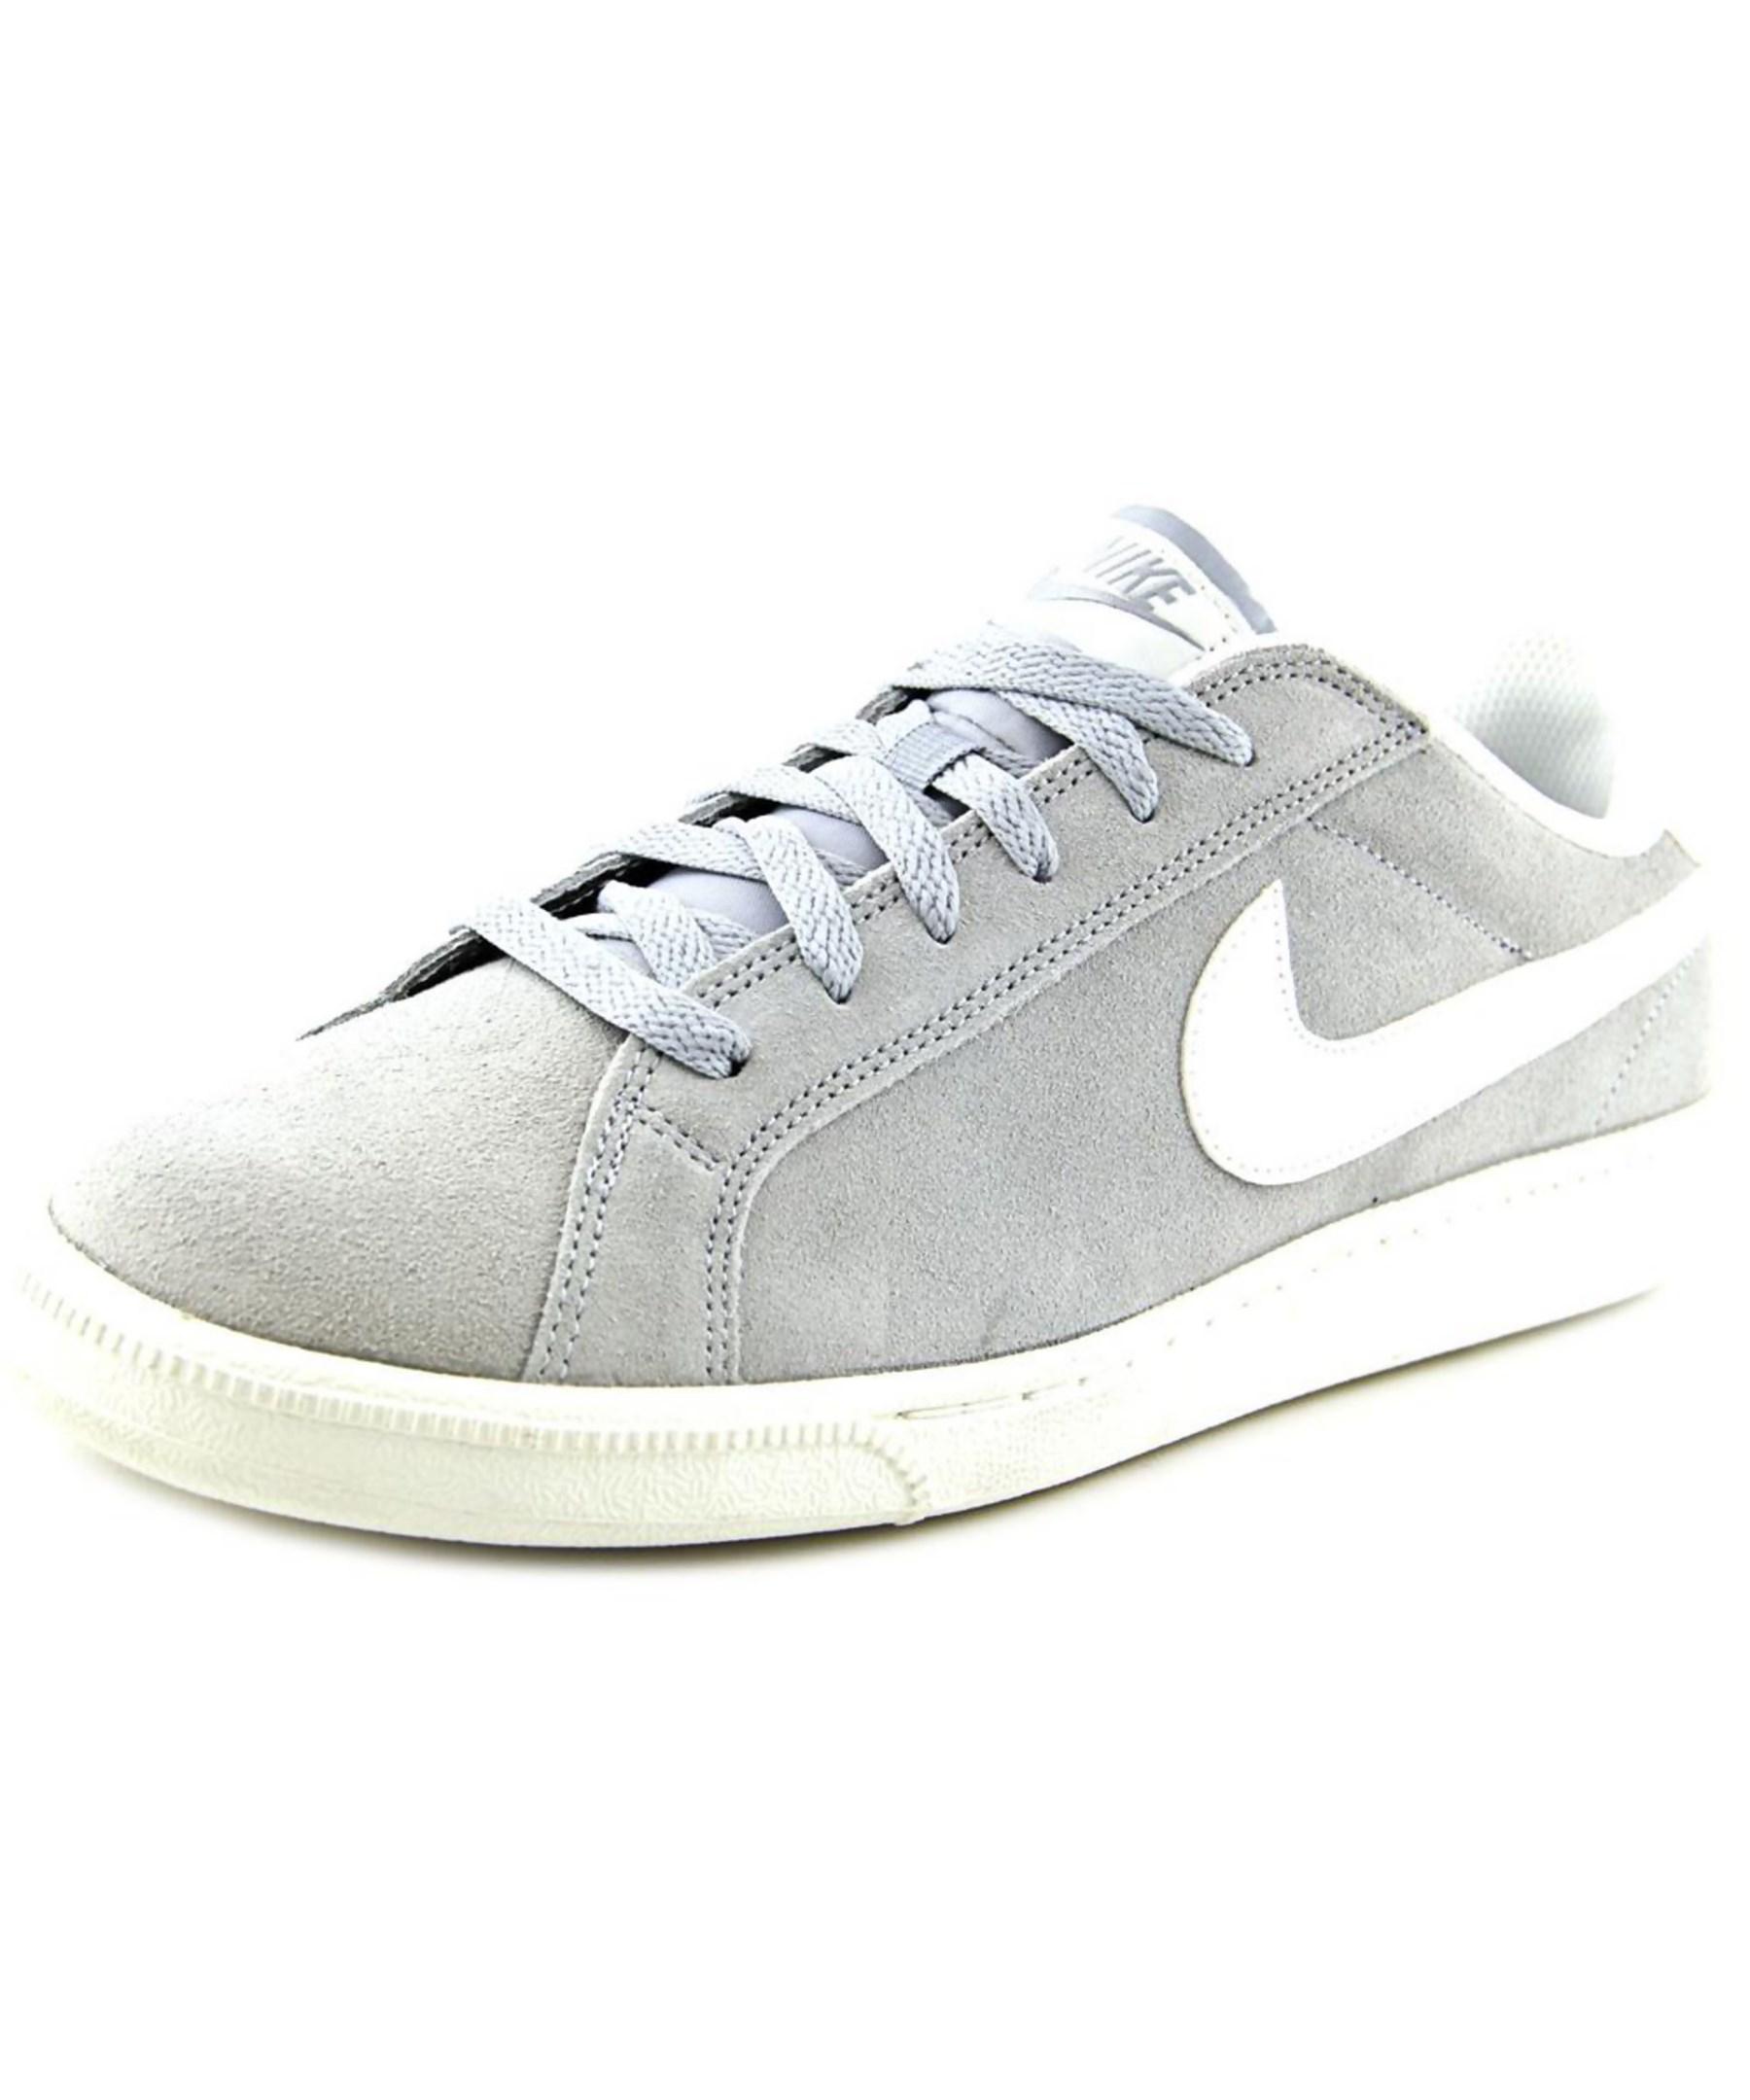 Nike Womens Court Majestic Tennis Shoes